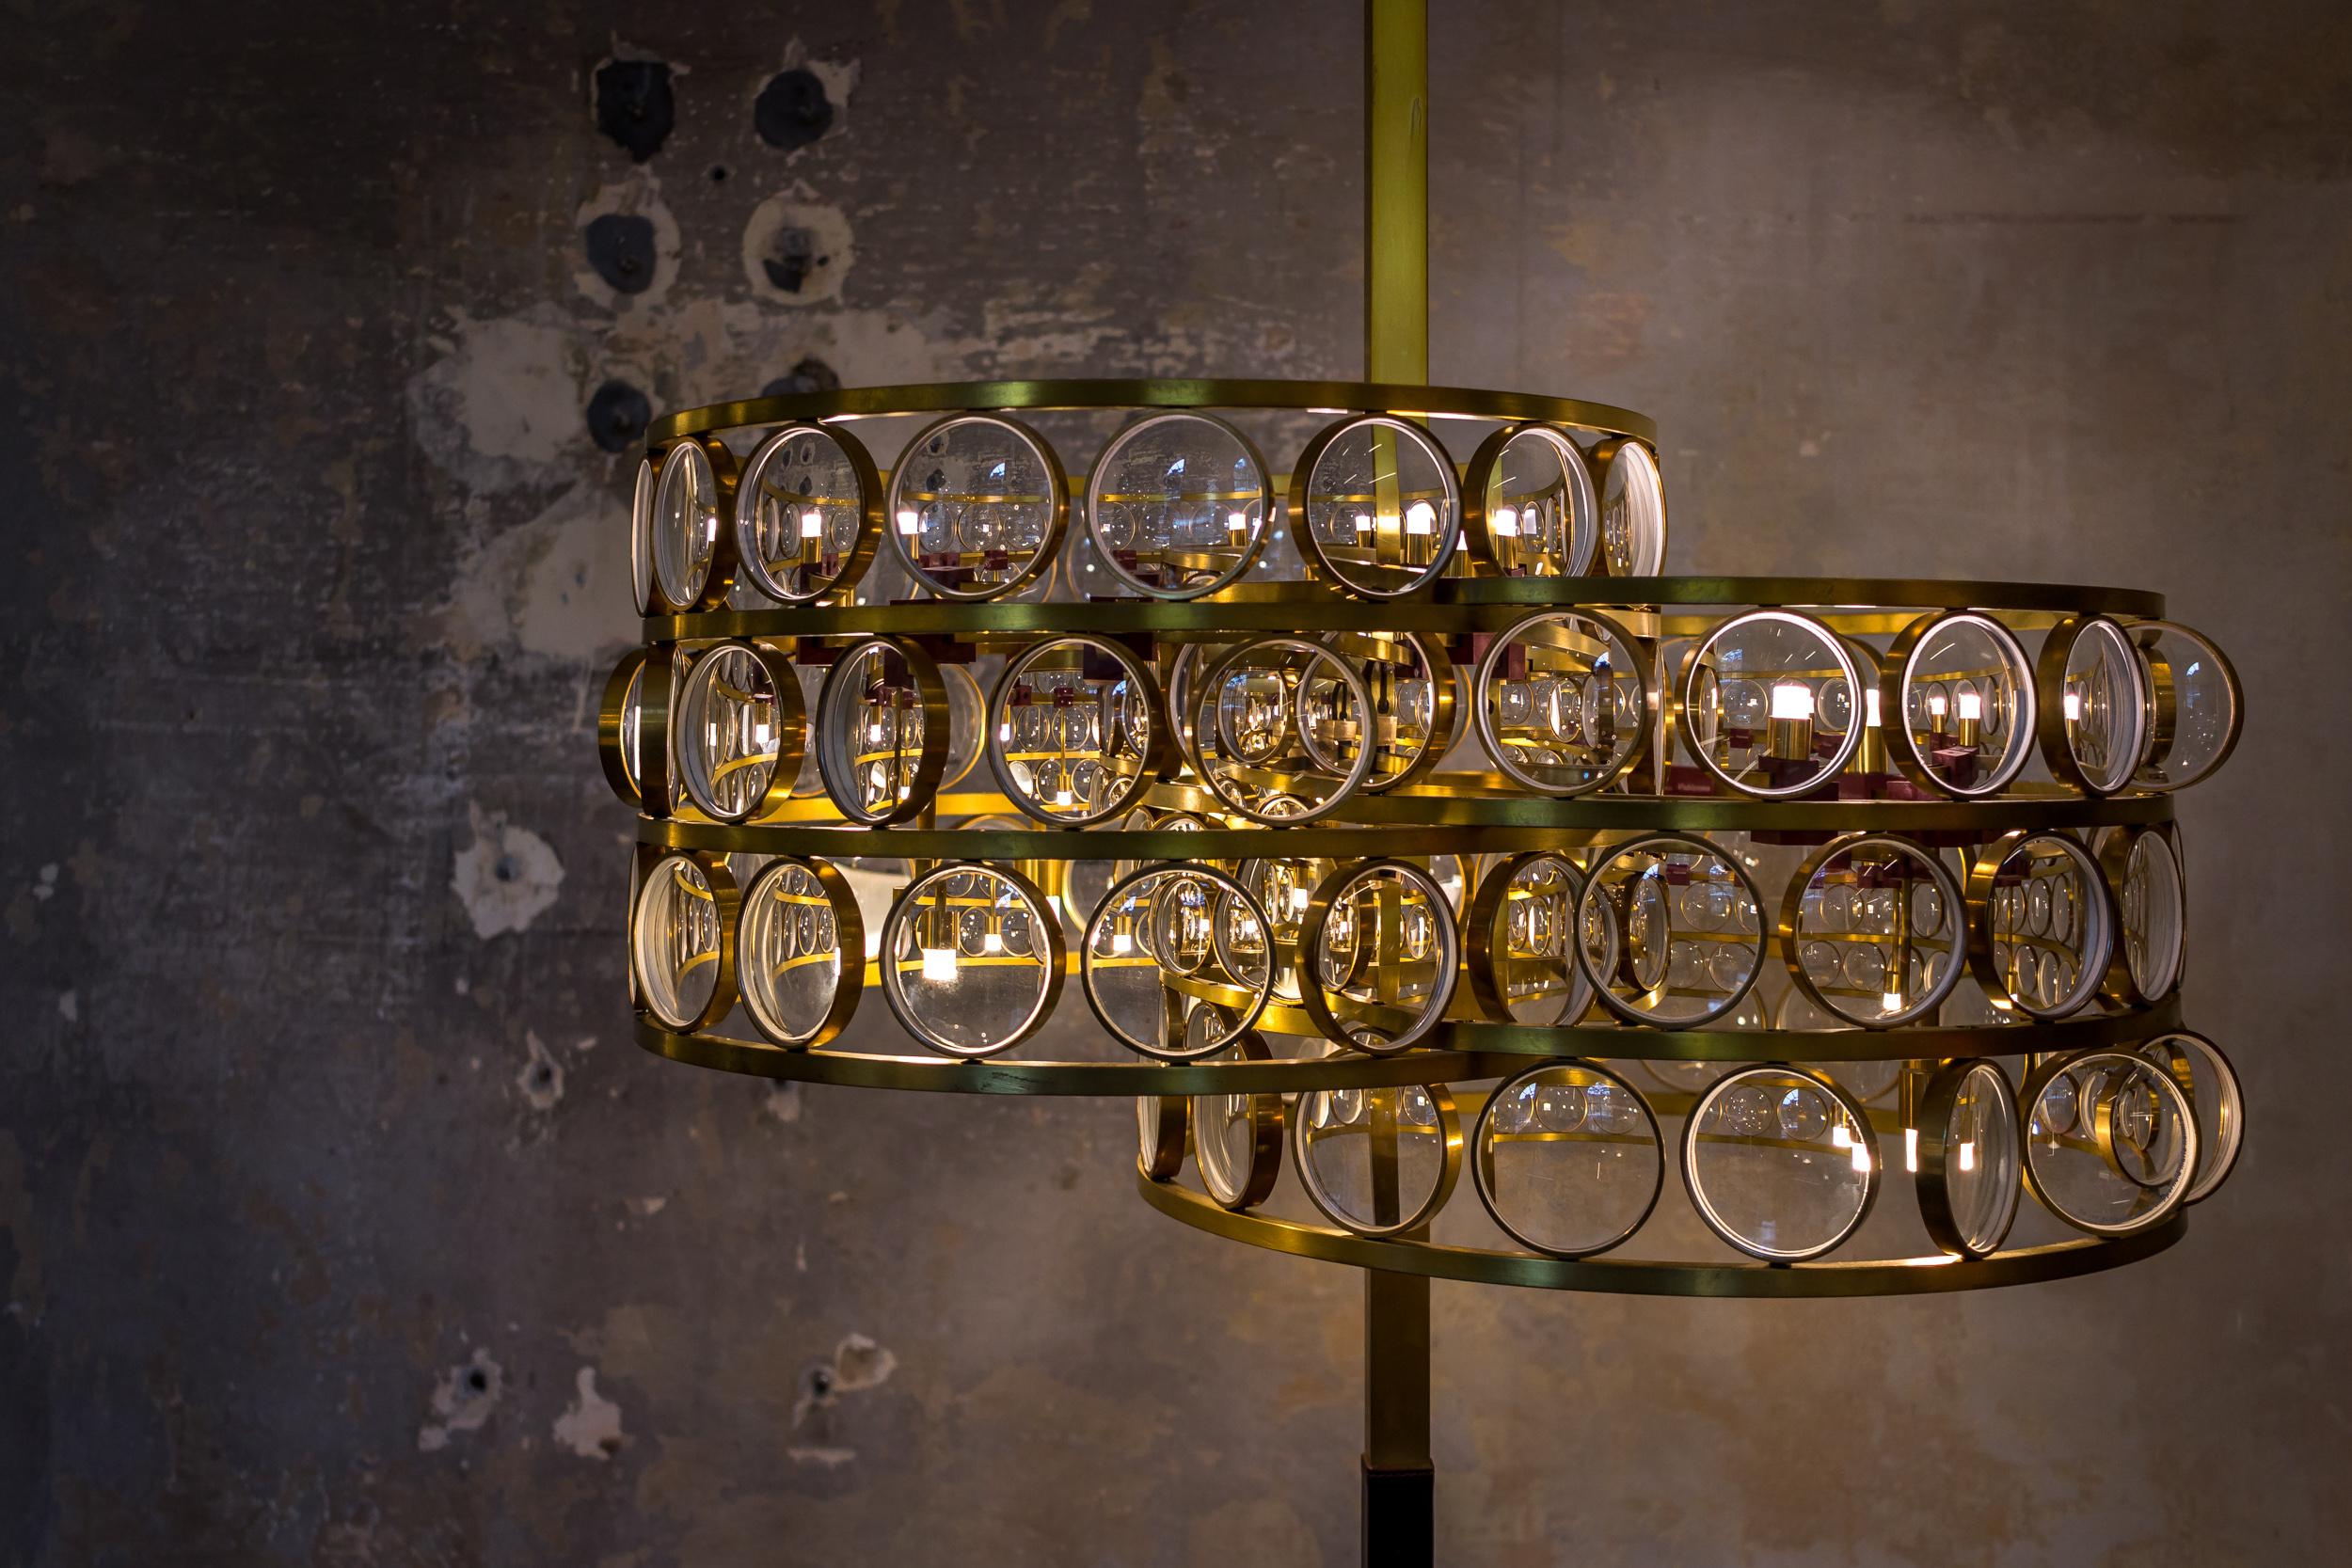 A Lamp I Presume